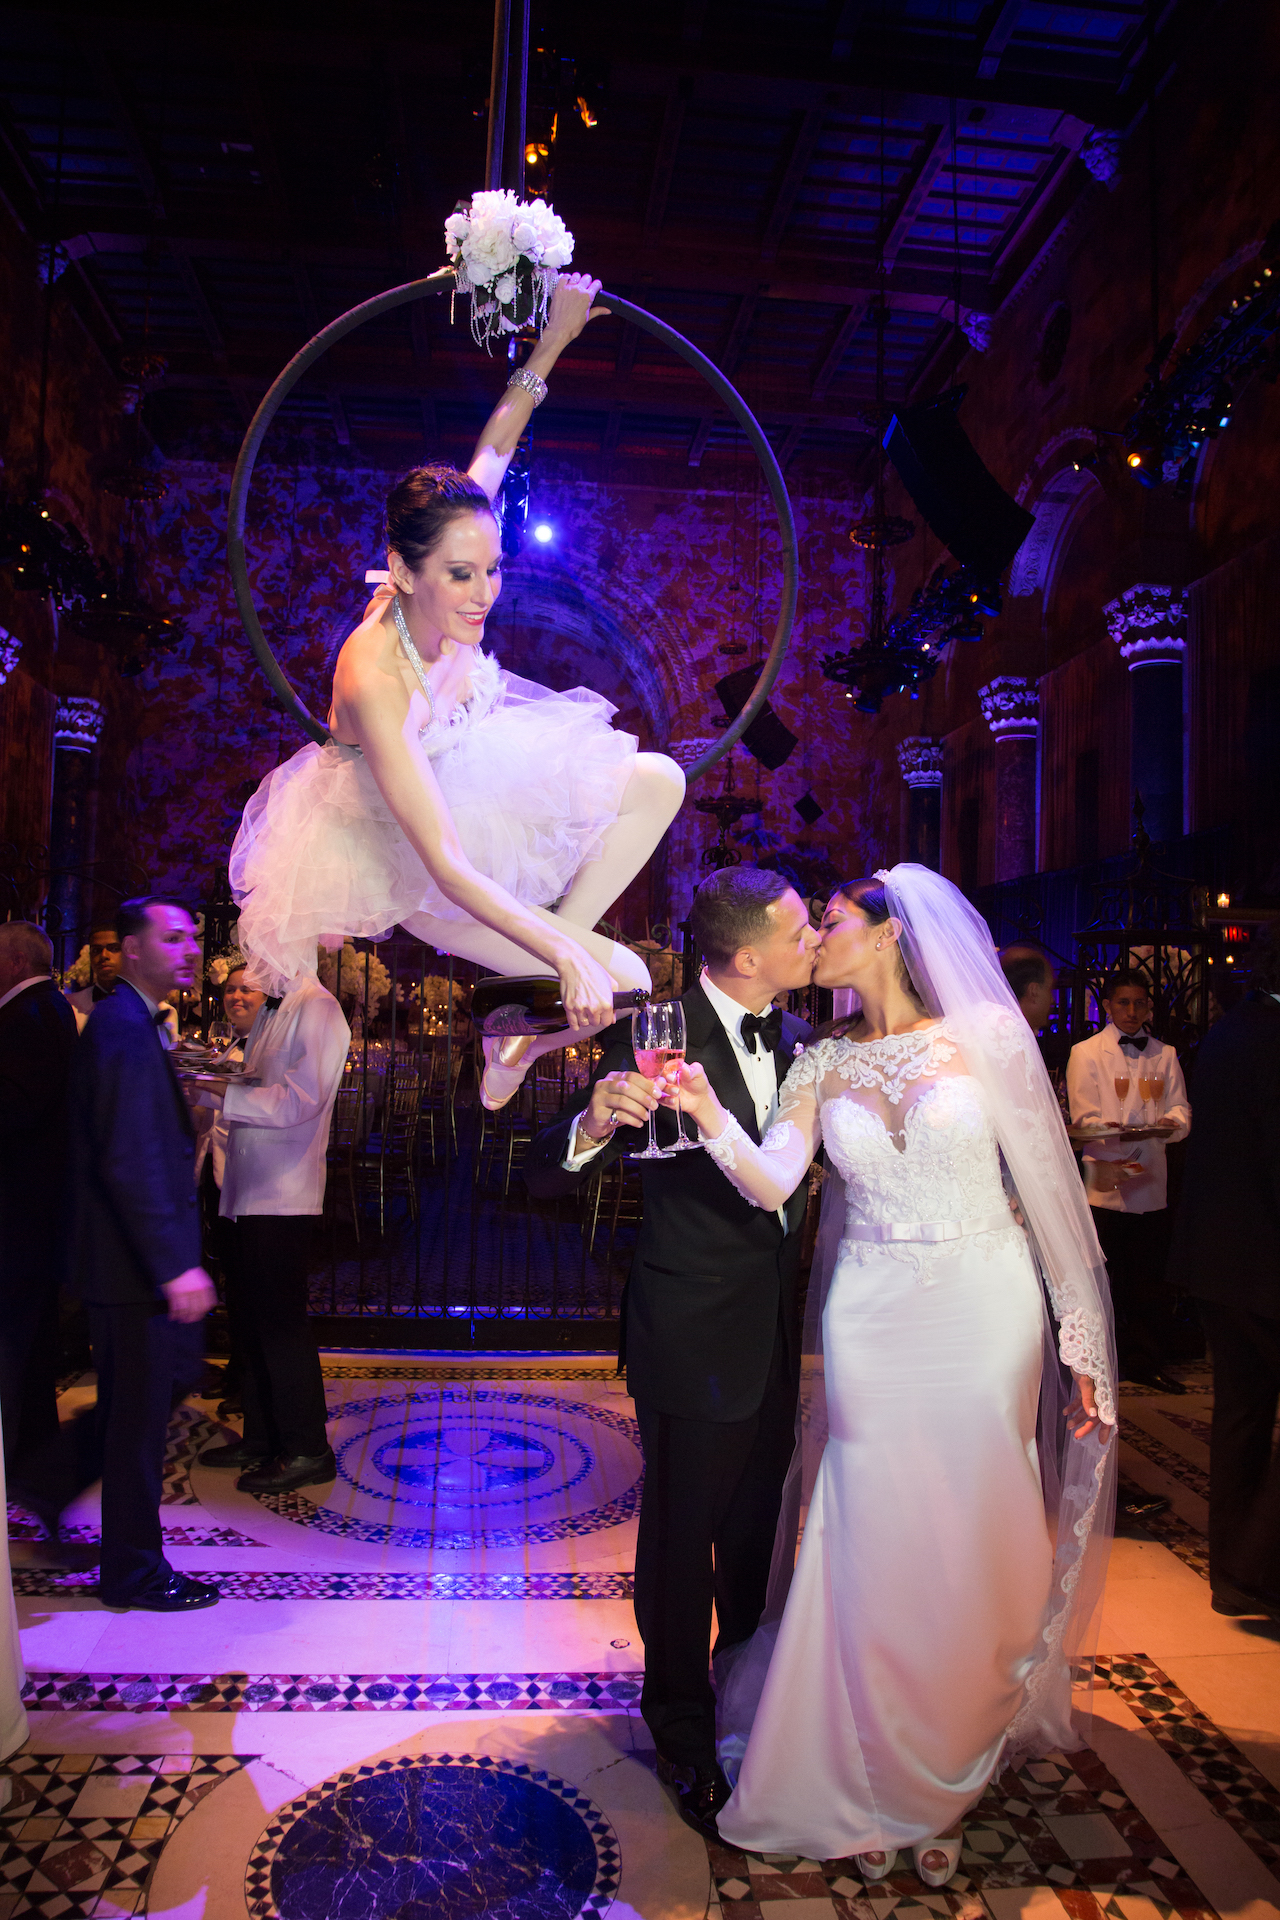 Aerial Champagne Cipriani Wedding 100 pixel.JPG